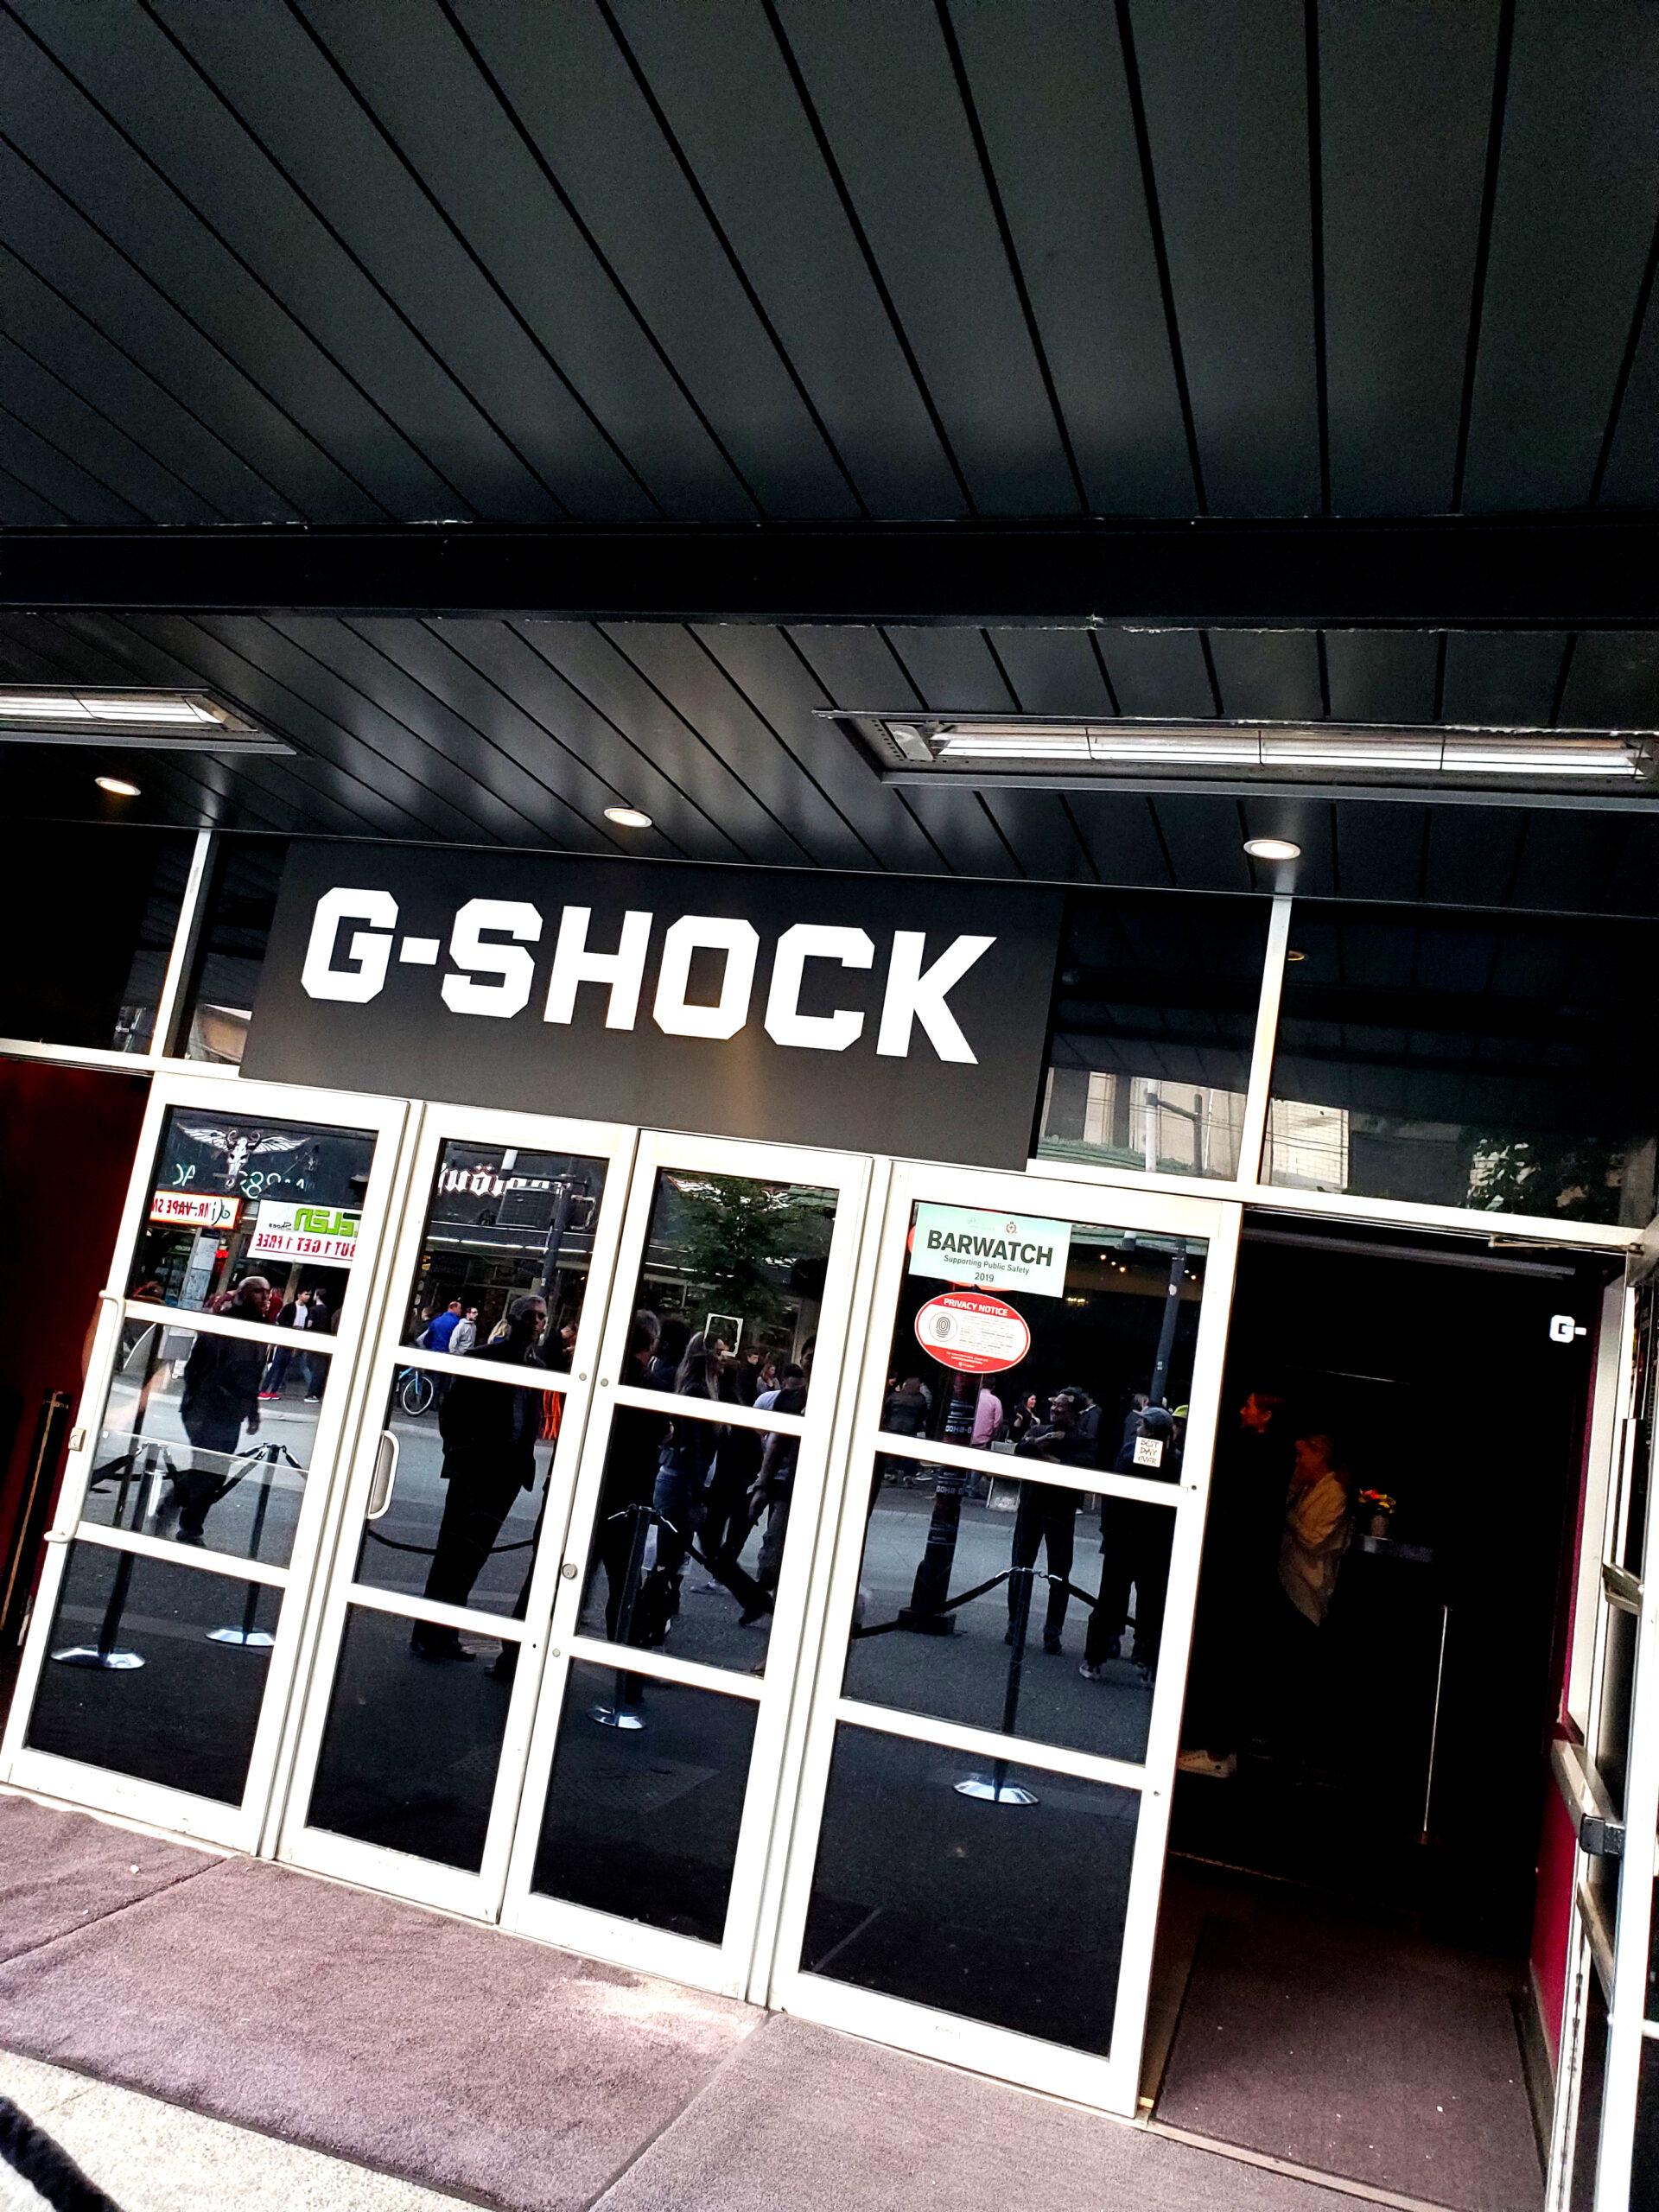 gshock, kikuo ibe, helen siwak, downtown vancouver, ecoluxluv, folioyvr, vancouver, bc, vancity, yvr